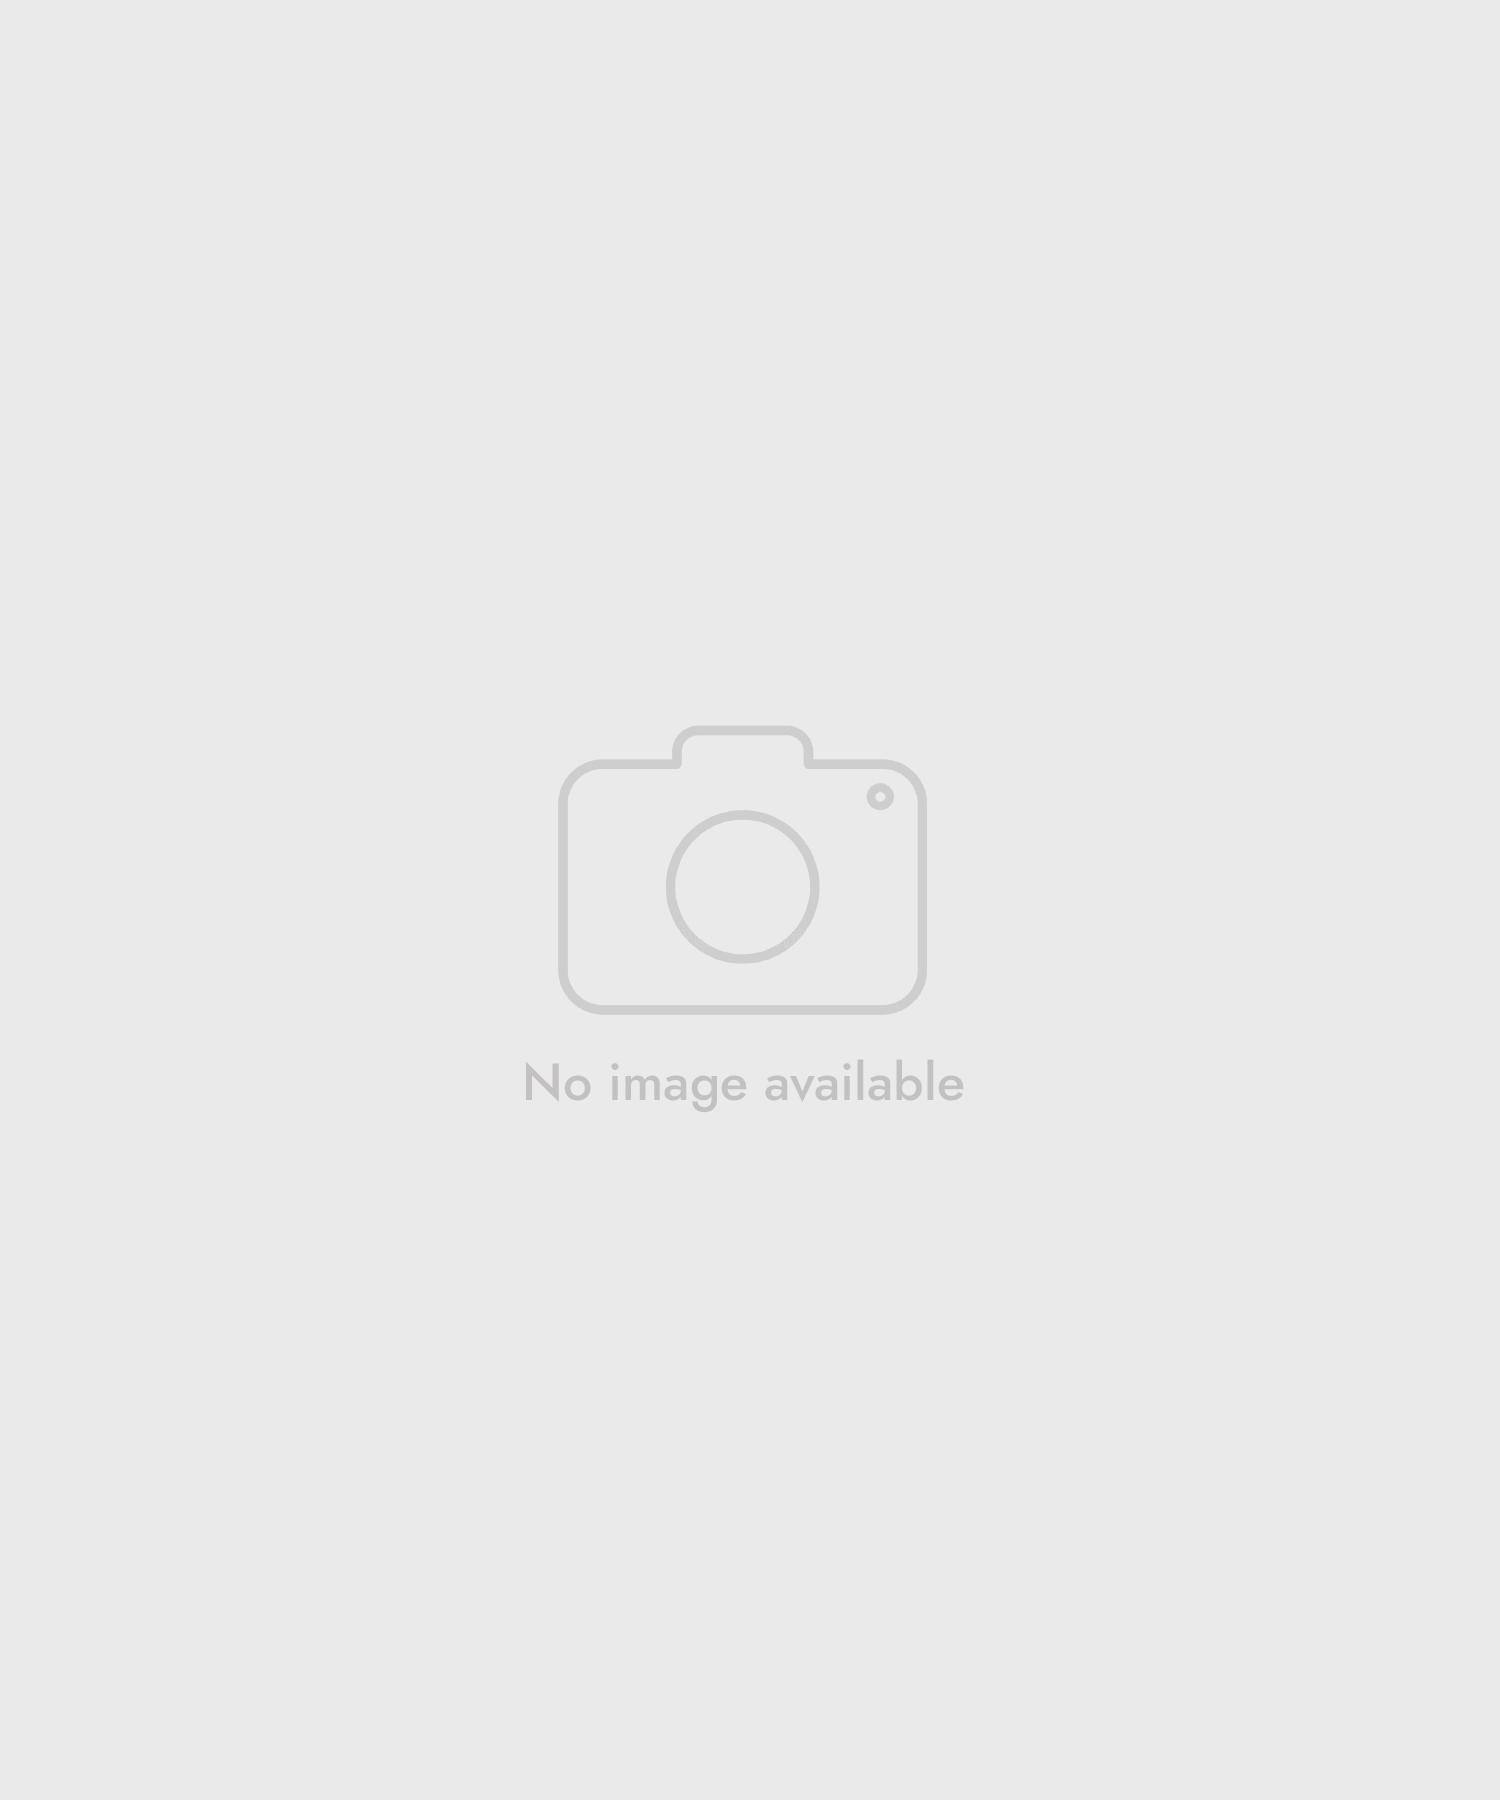 Multikolorowe skórzane botki damskie